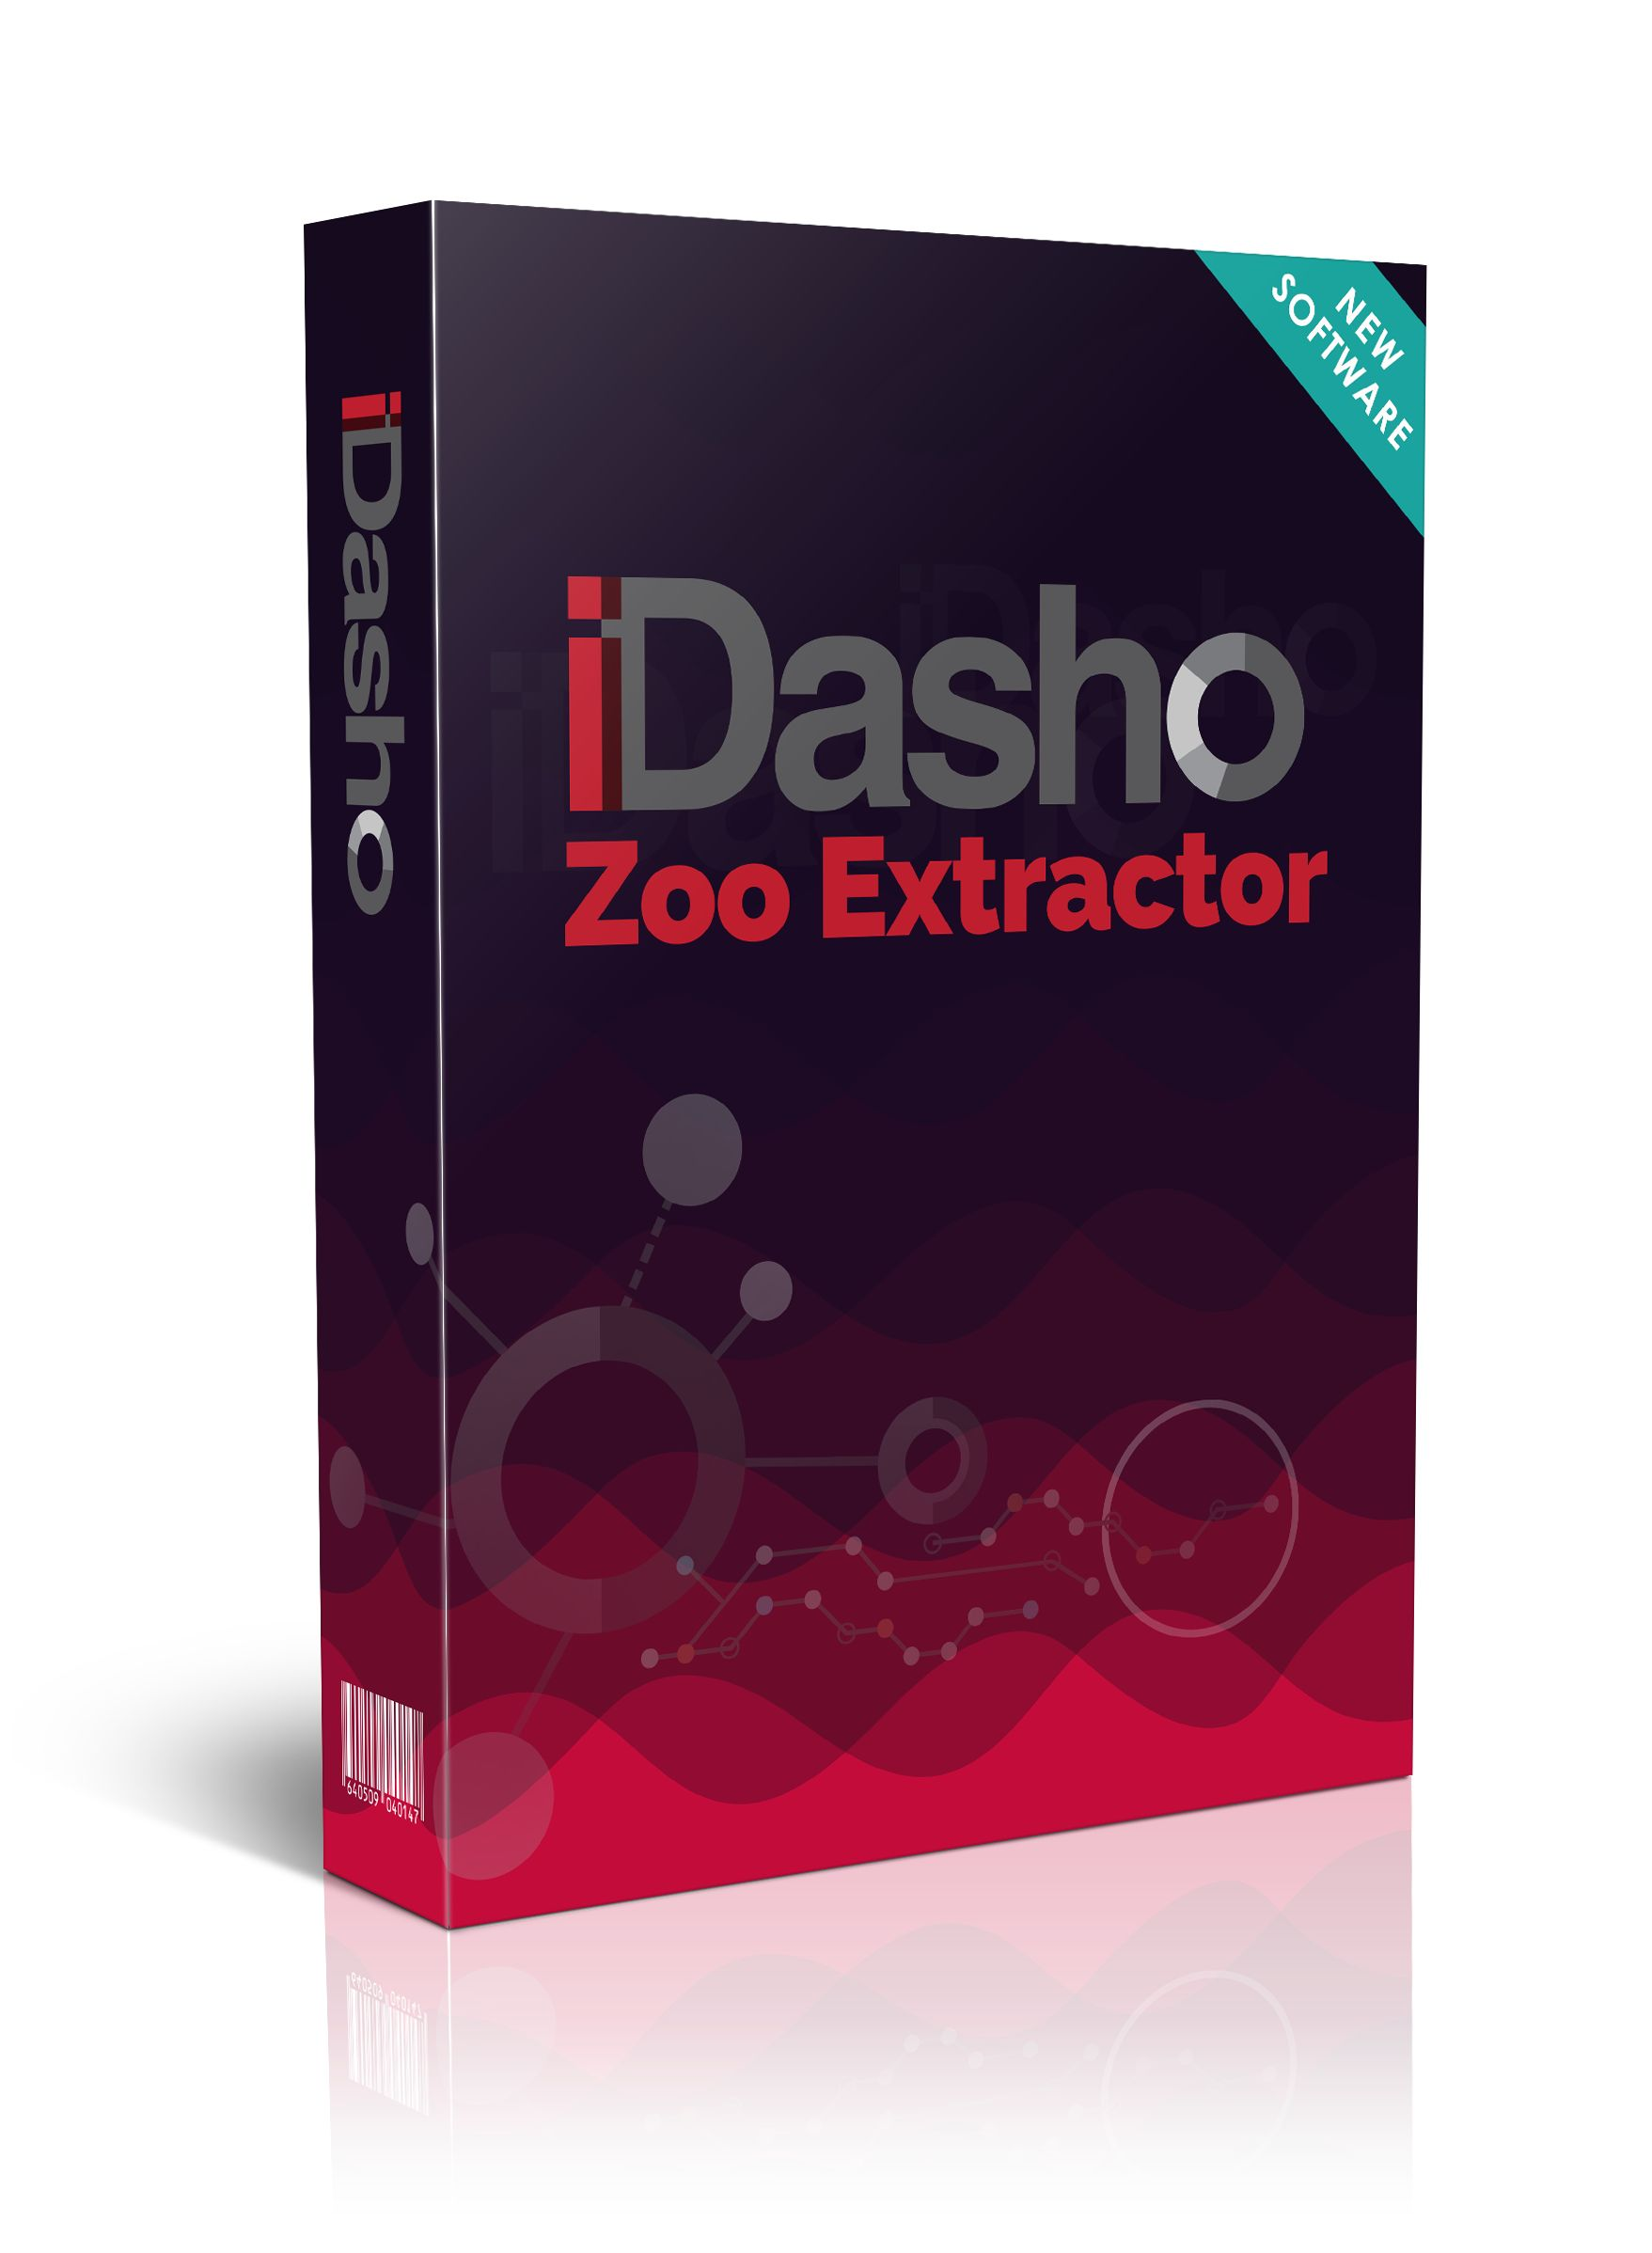 iDasho Zoo Extractor Review